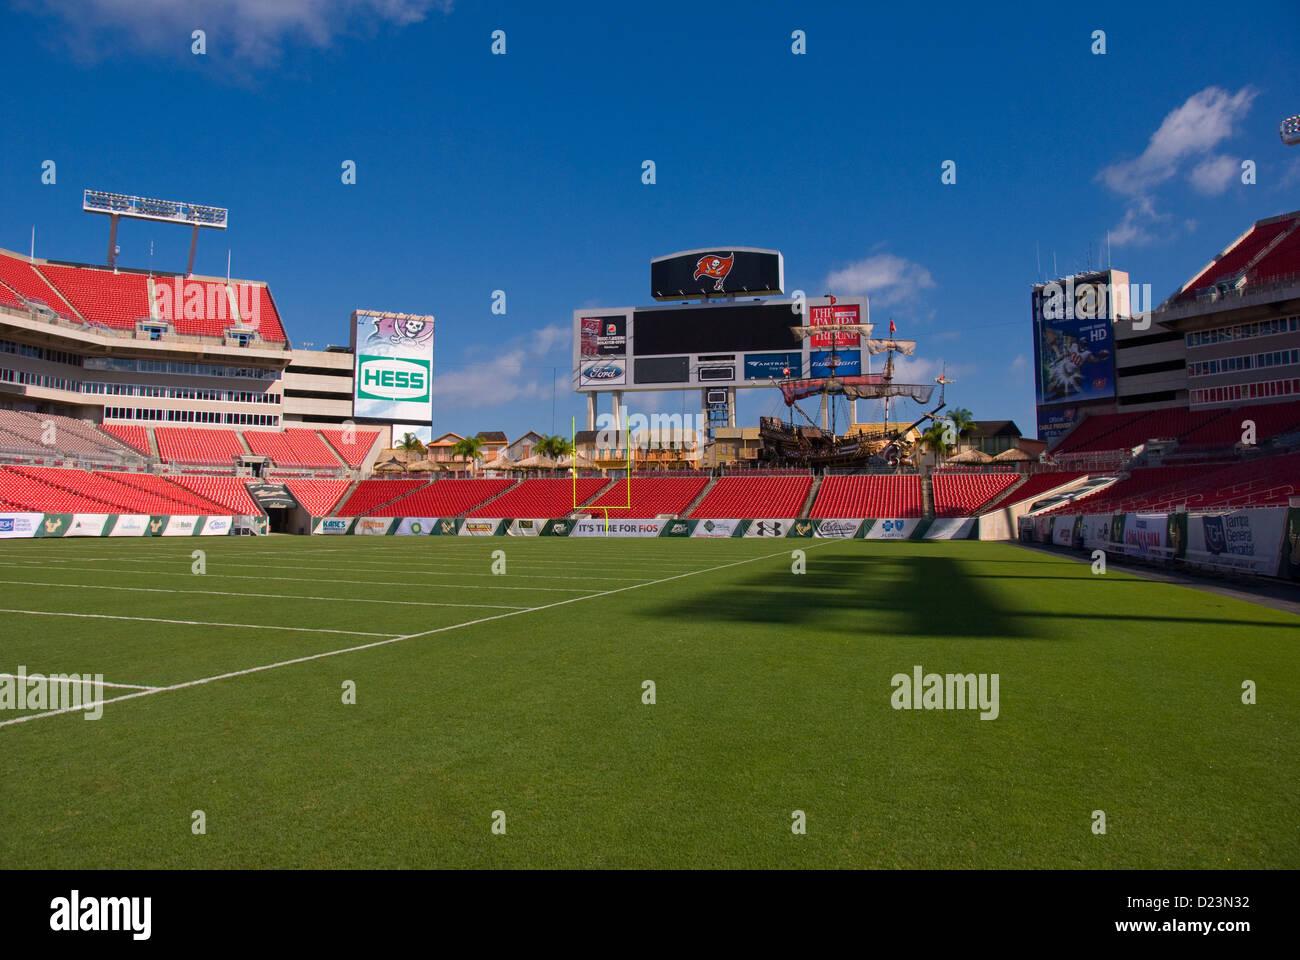 Raymond James Football Stadium In Tampa Florida Where The Tampa Bay Stock Photo Alamy